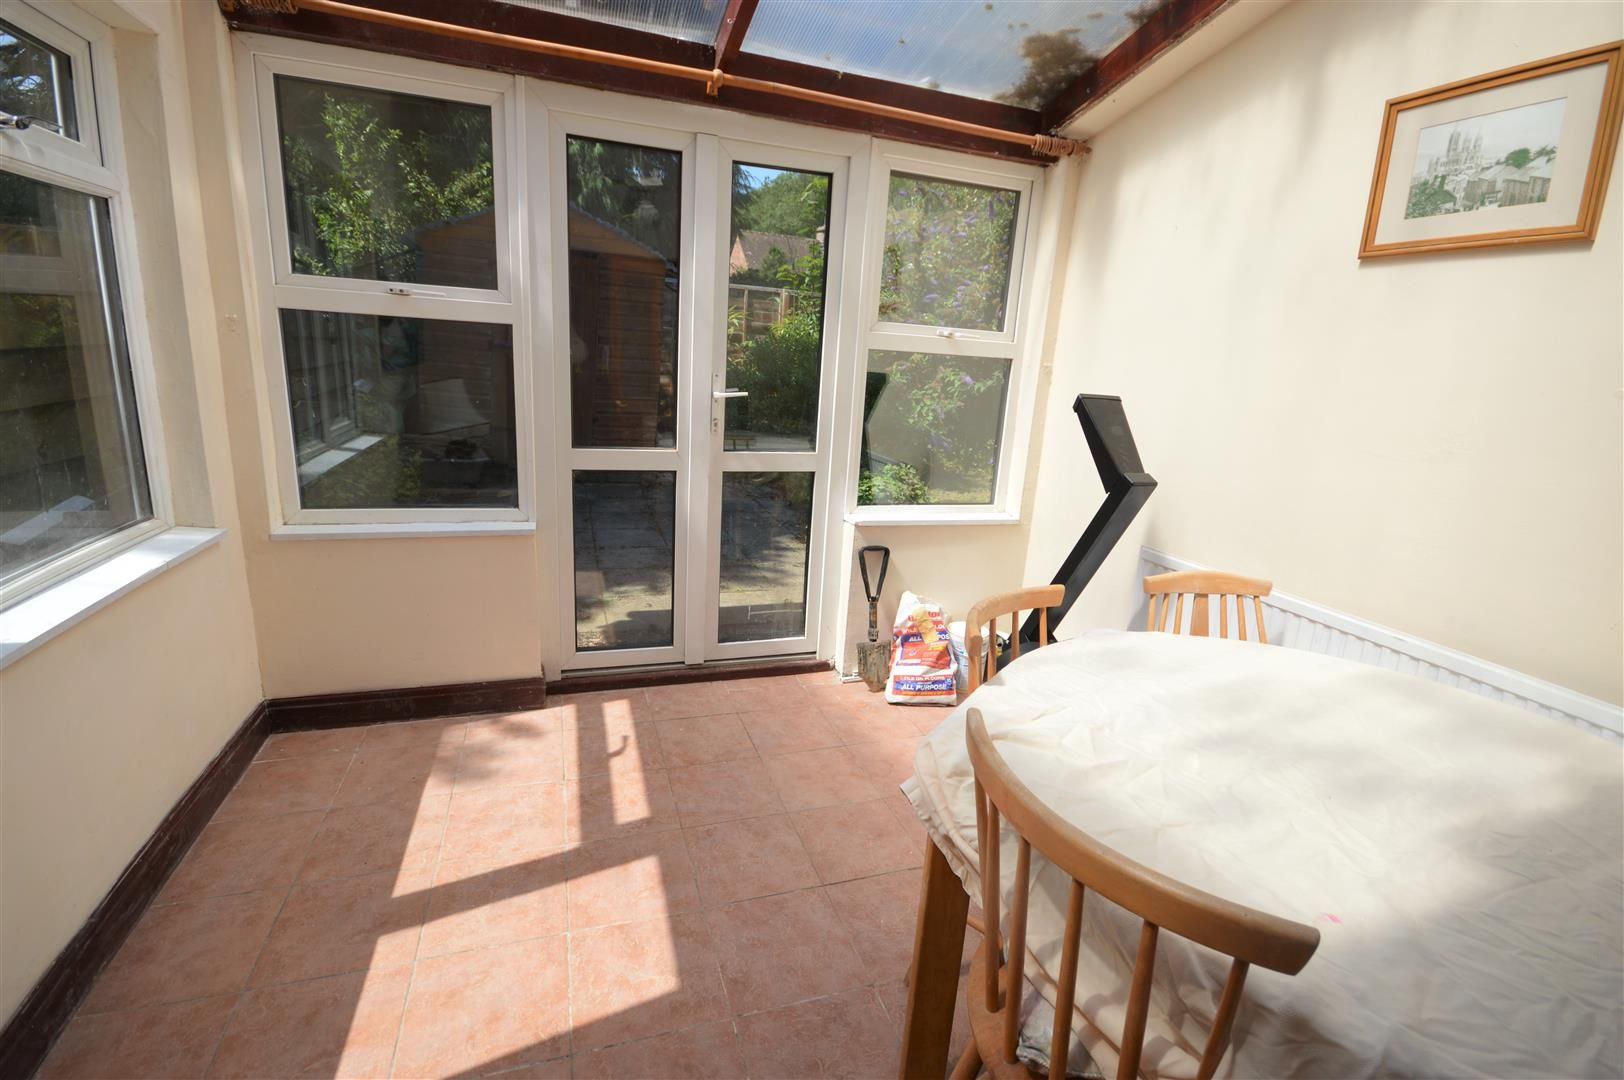 4 bed semi-detached for sale in Presteigne 5